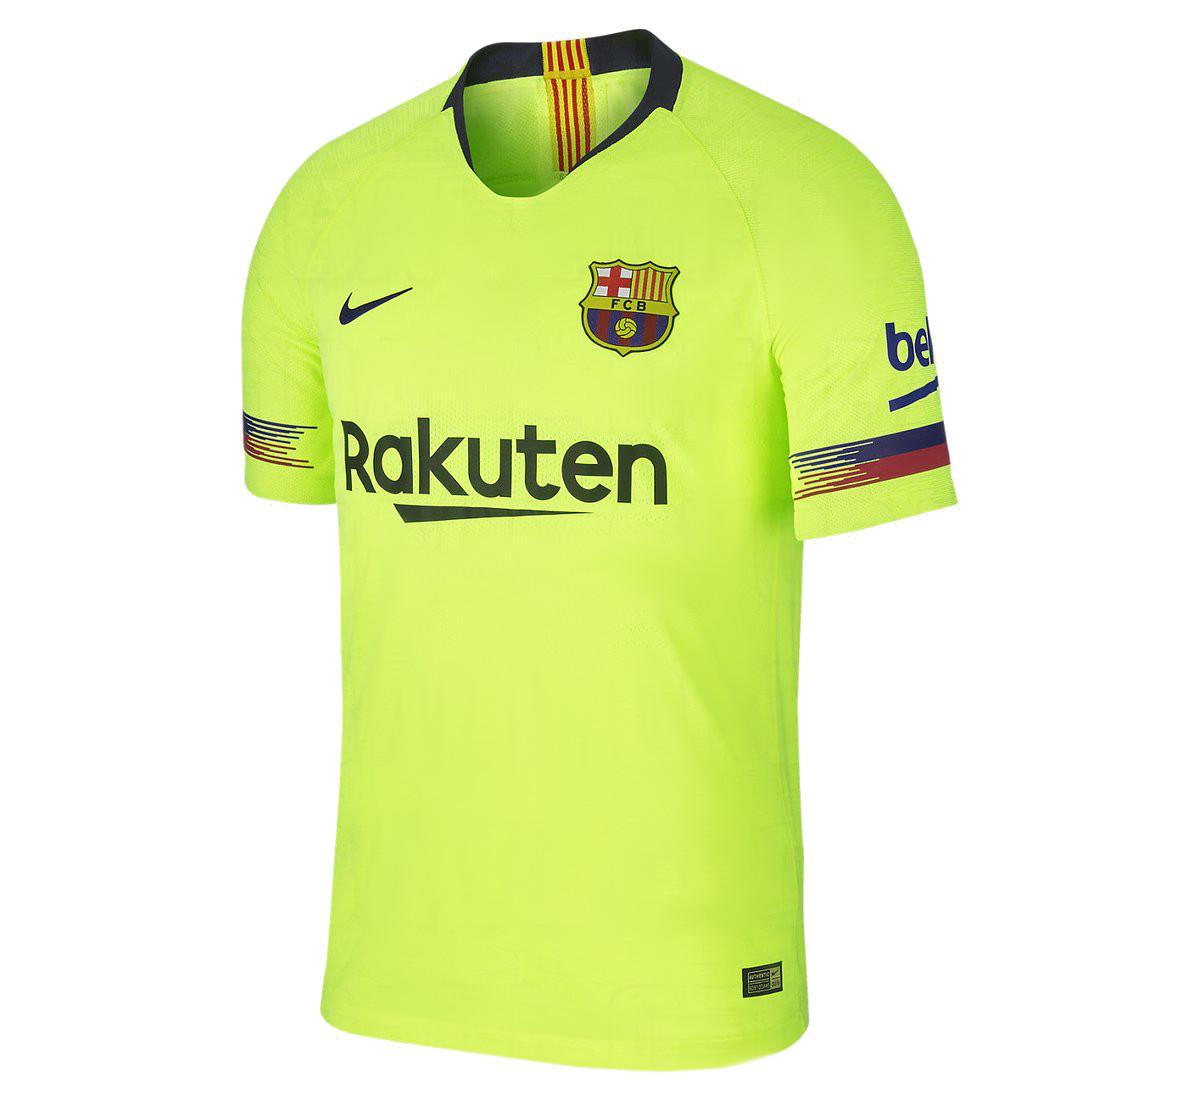 FC Barcelone 2018 2019 maillot de foot exterieur jaune